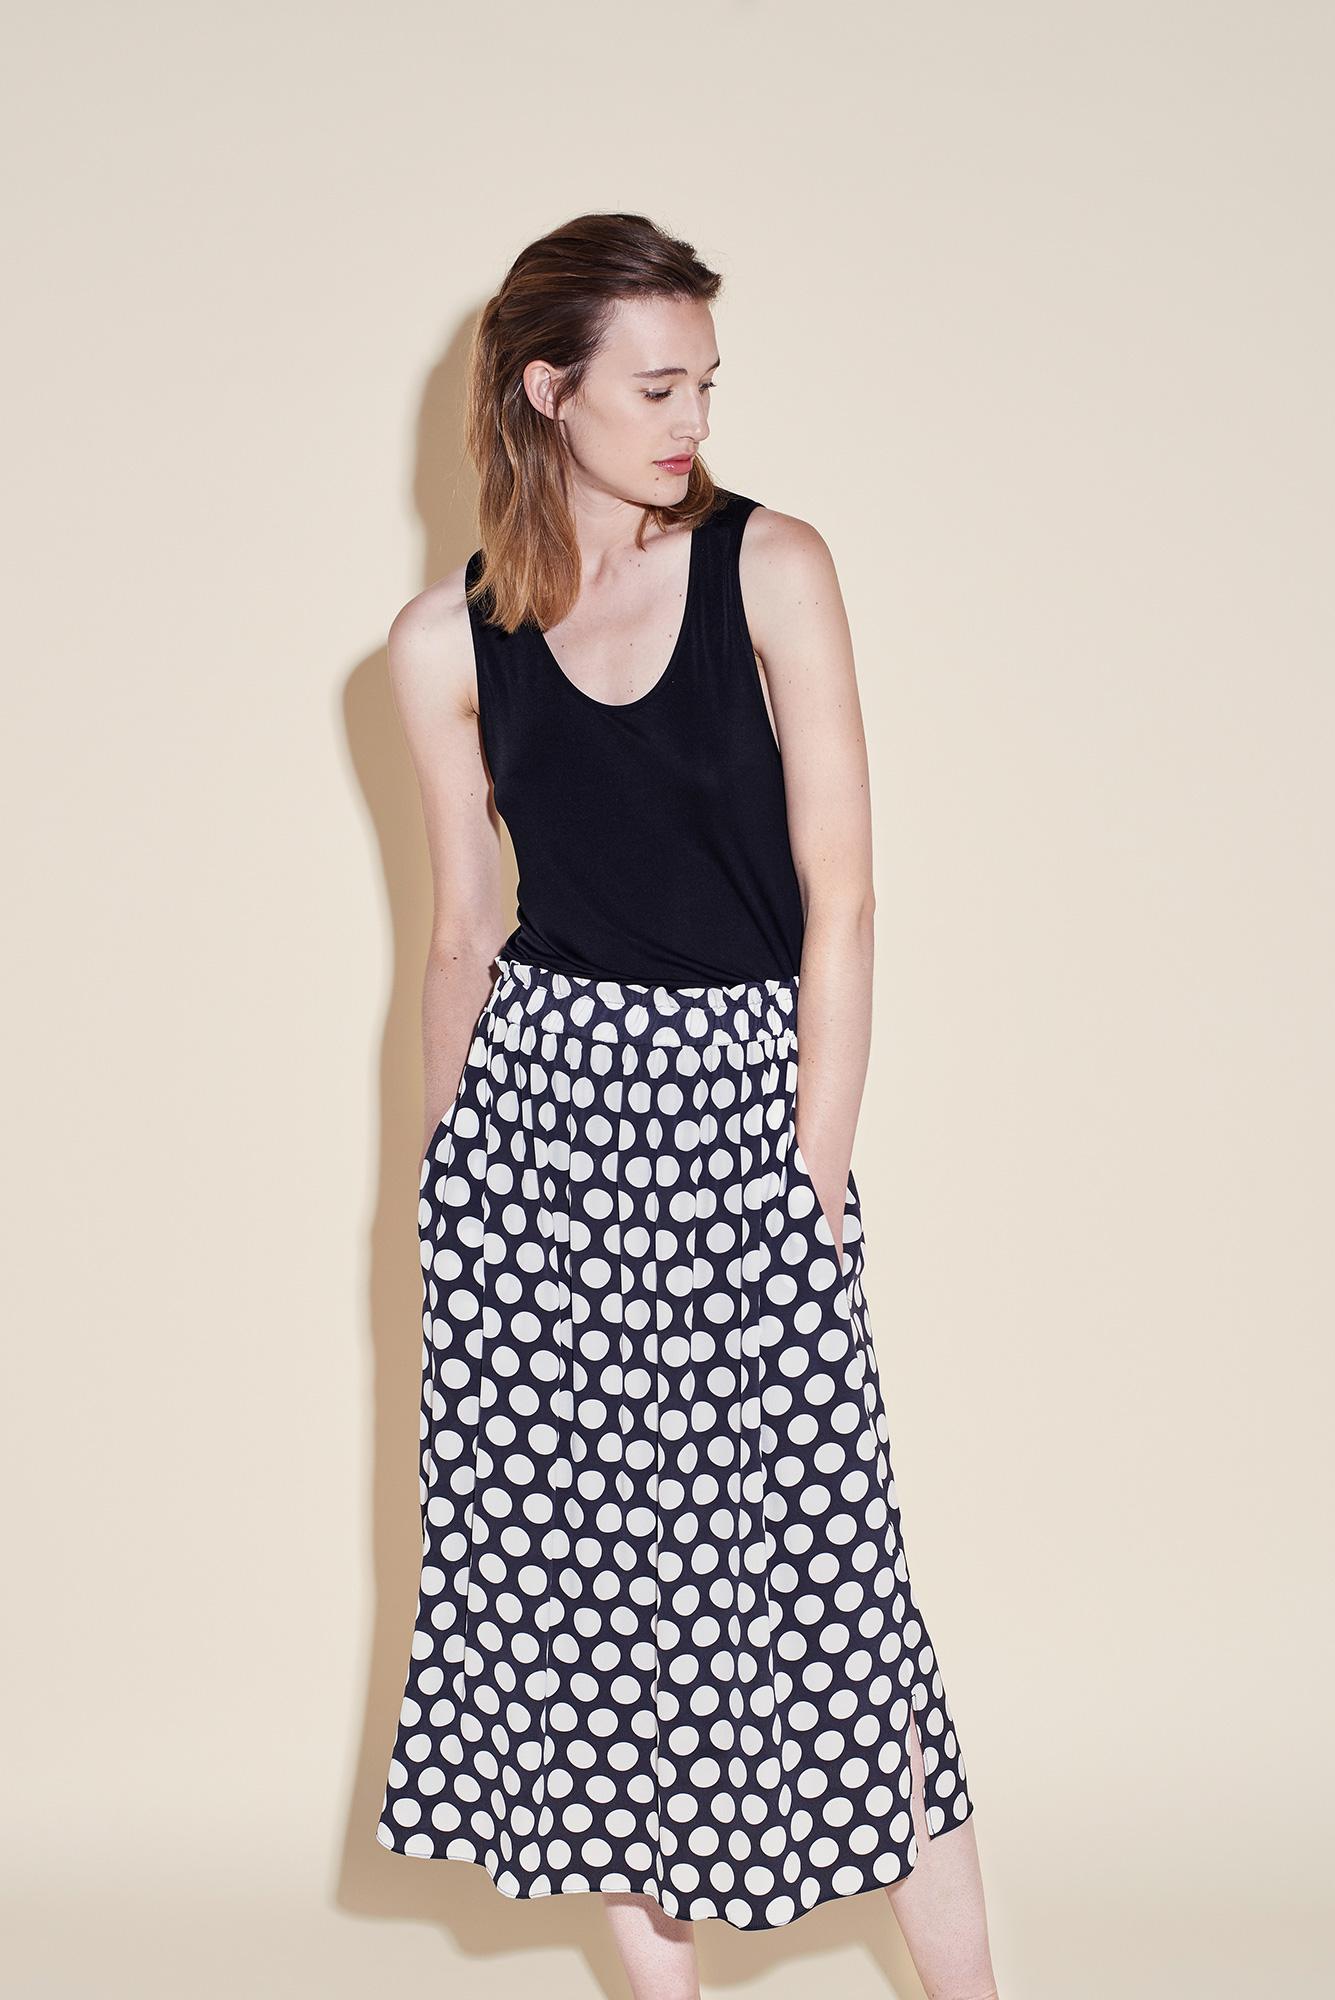 Long skirt crepe silk polka dots white tank top silk jersey black